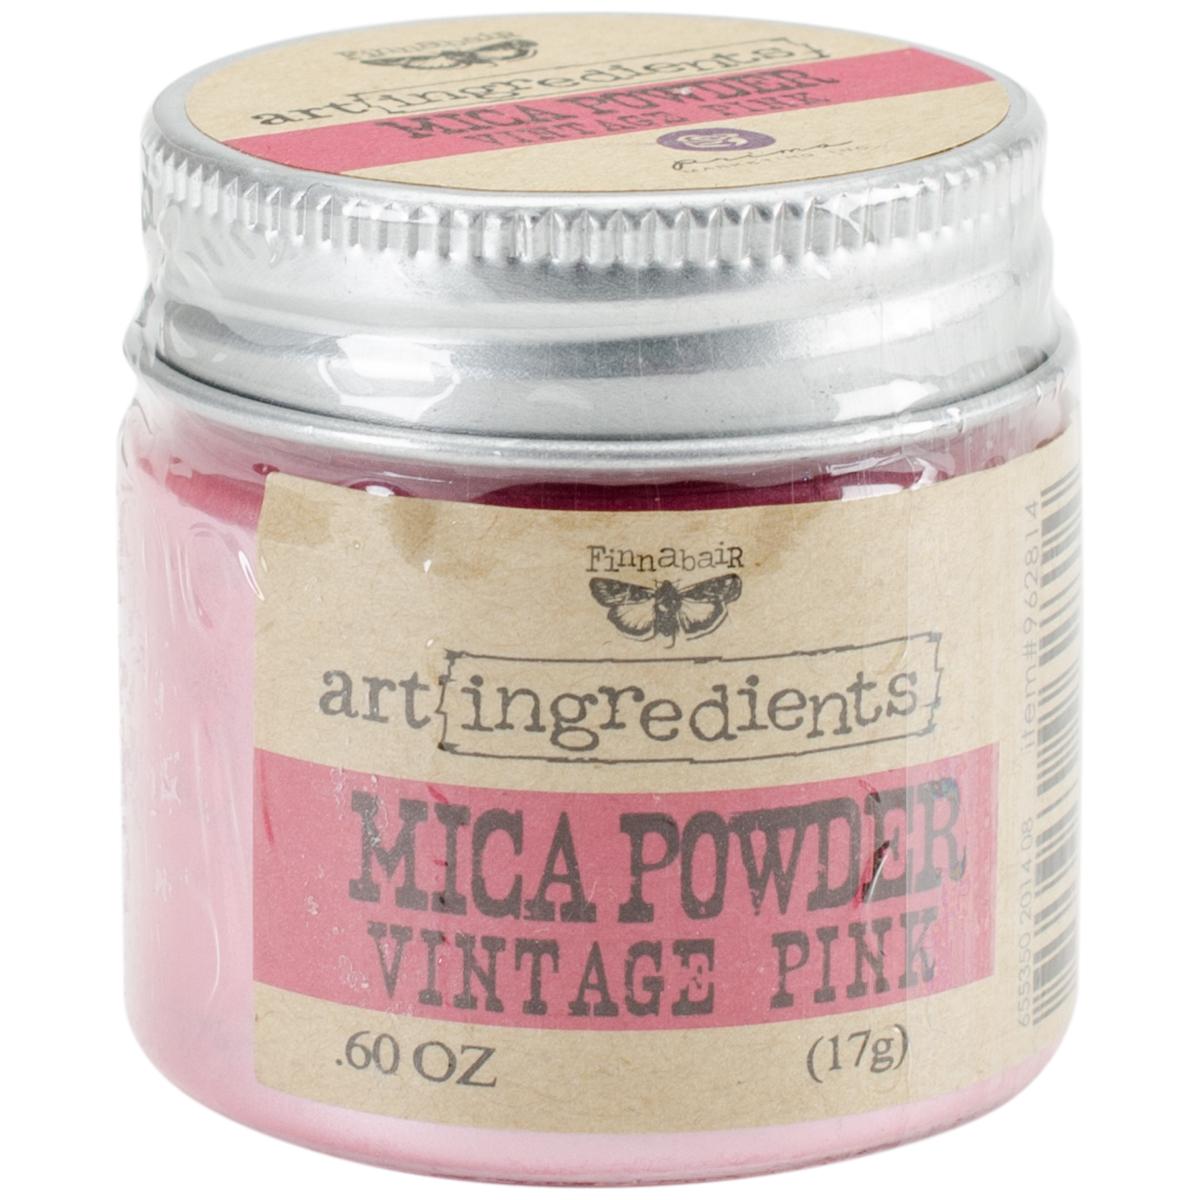 Mica Powder - Vintage Pink